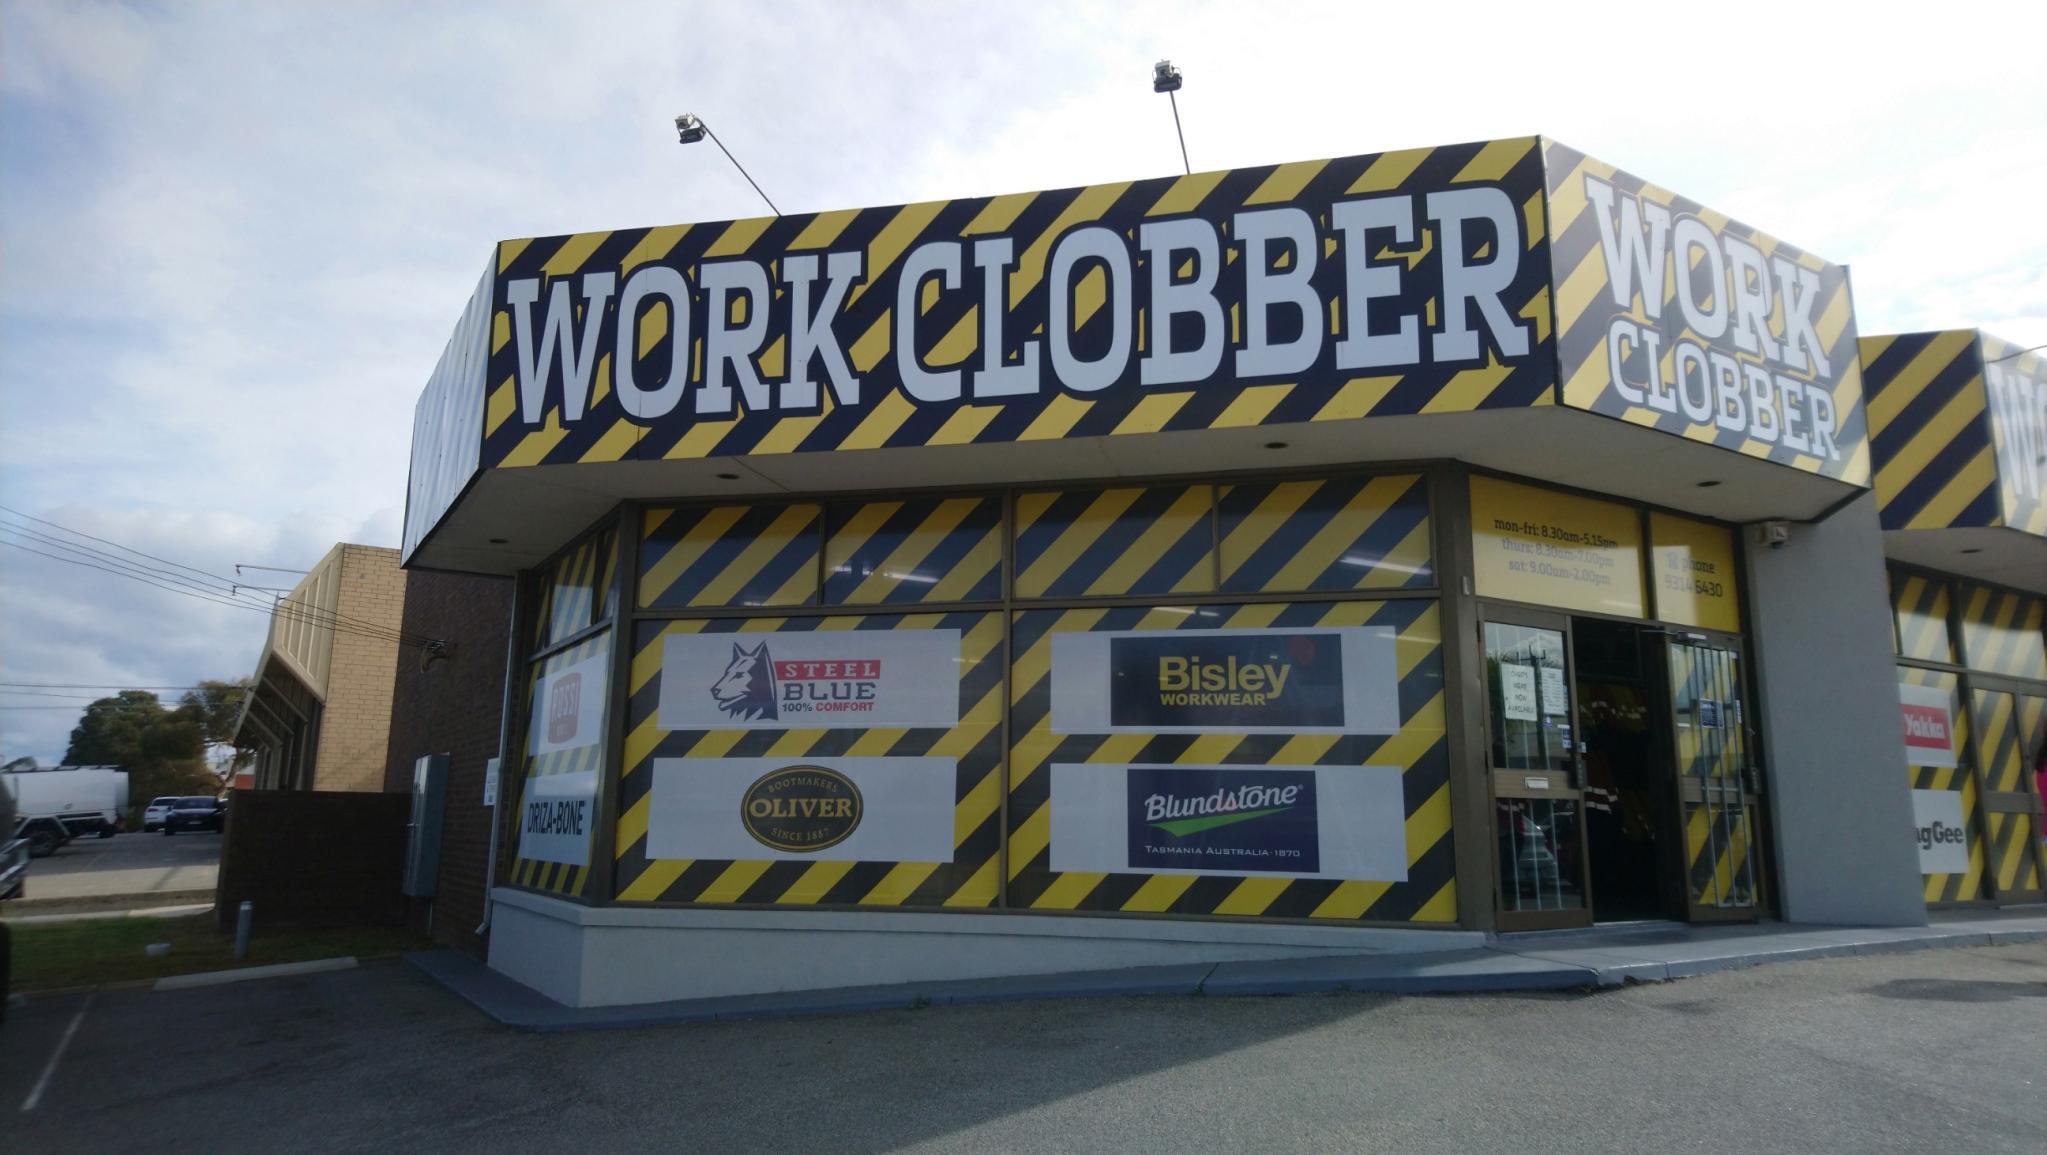 Work Clobber